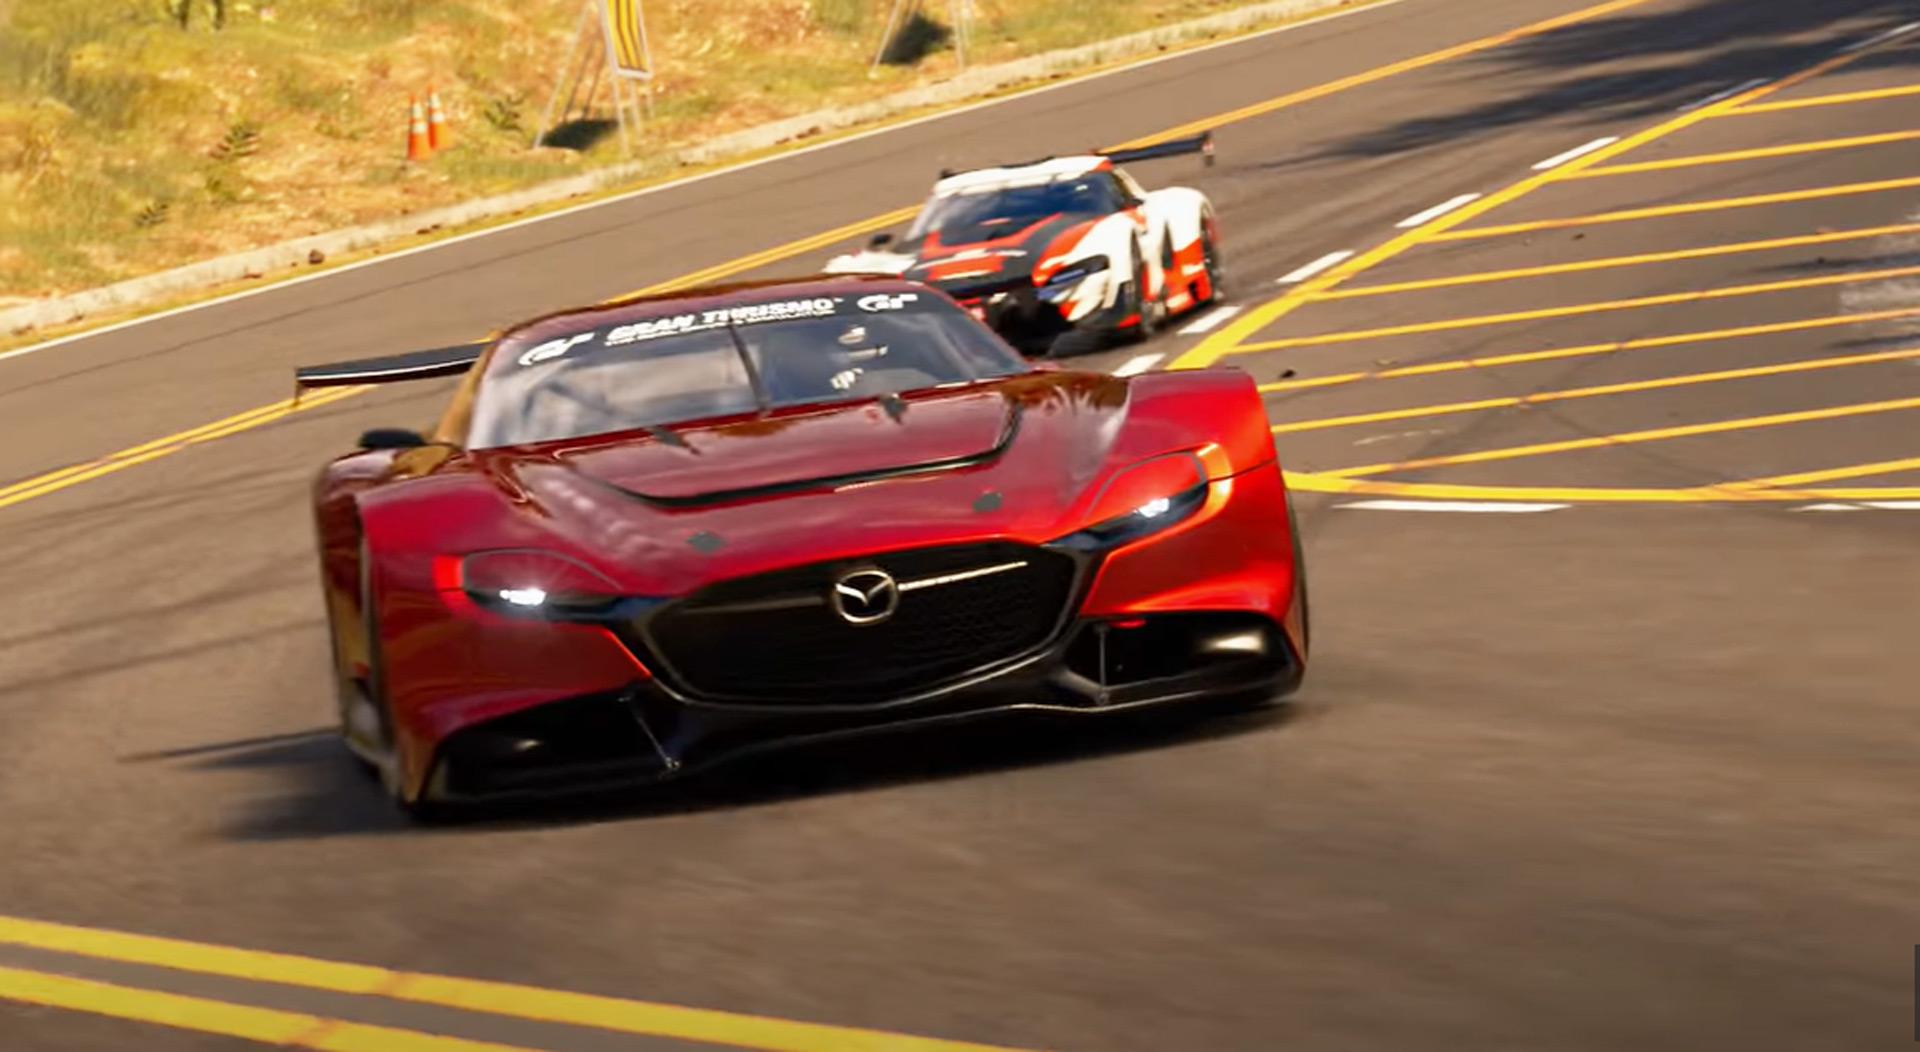 Gran Turismo 7 should arrive in 2021